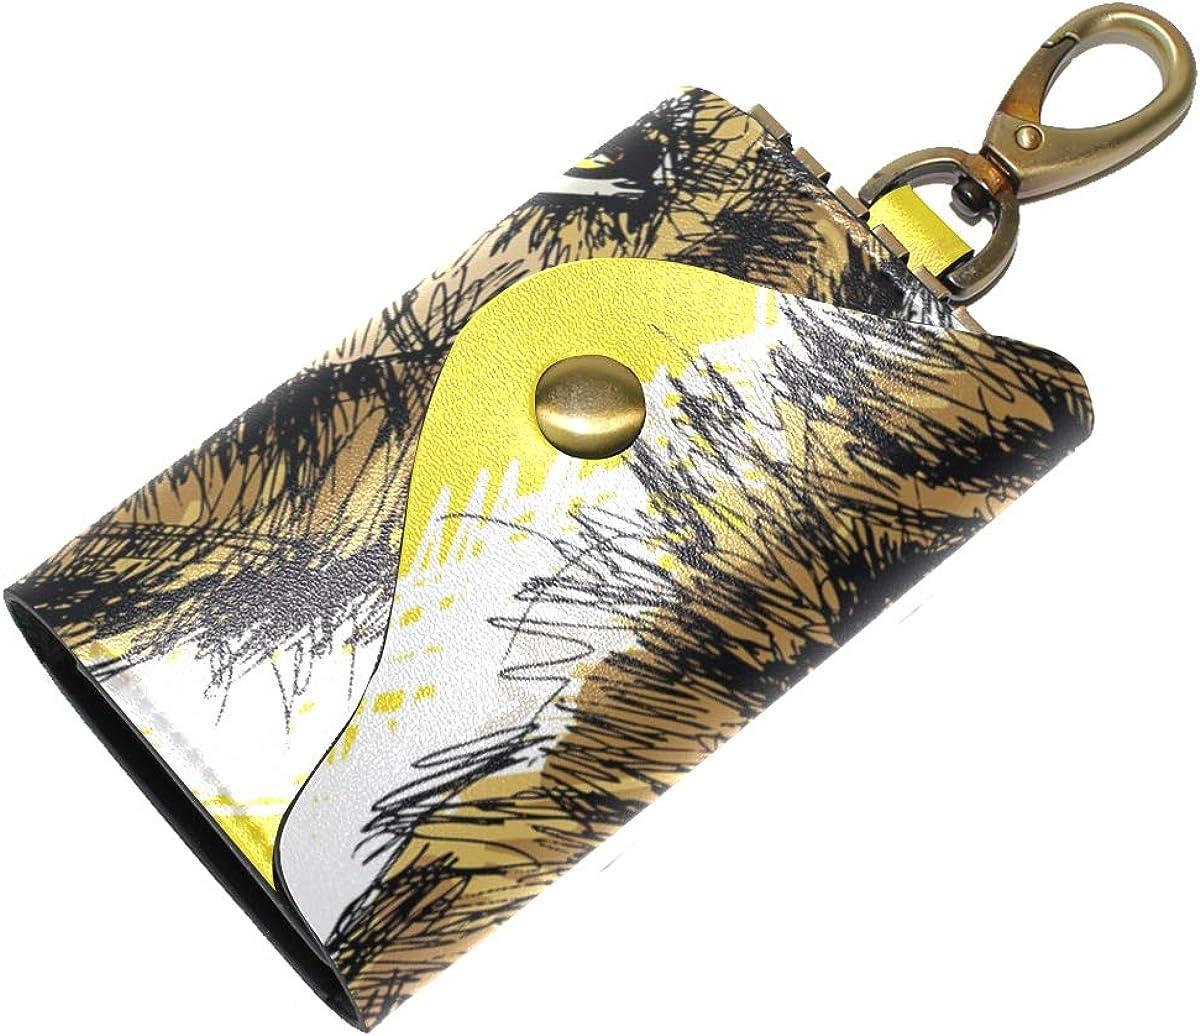 KEAKIA Roaring Lion Leather Key Case Wallets Tri-fold Key Holder Keychains with 6 Hooks 2 Slot Snap Closure for Men Women